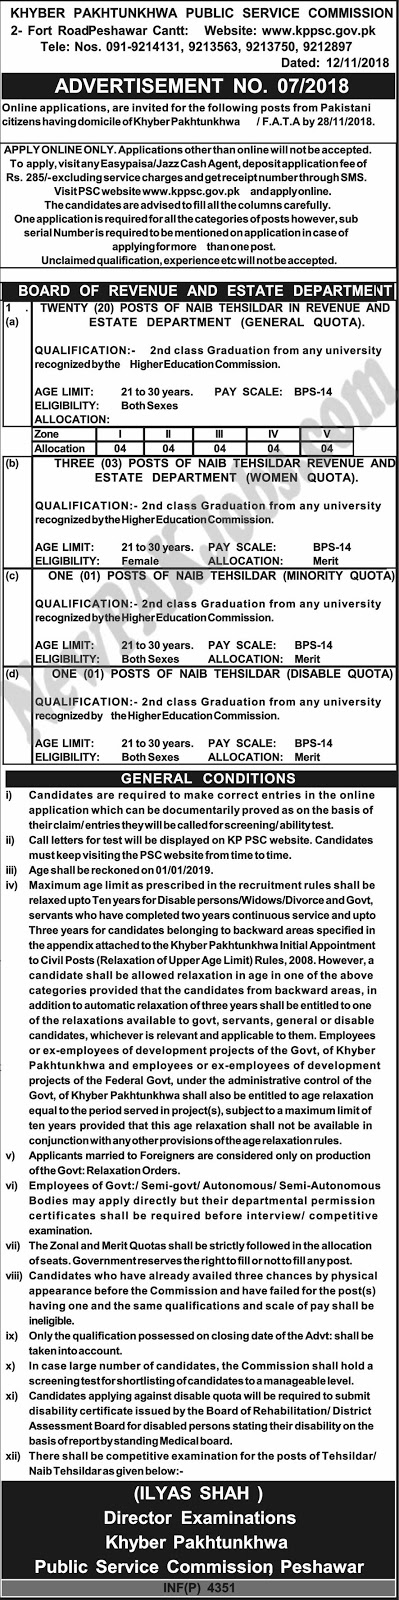 Naib Tehsildar Jobs in KPPSC Nov 2018 Advertisement No 7/2018, Khyber Pakhtunkhwa Public Service Commission